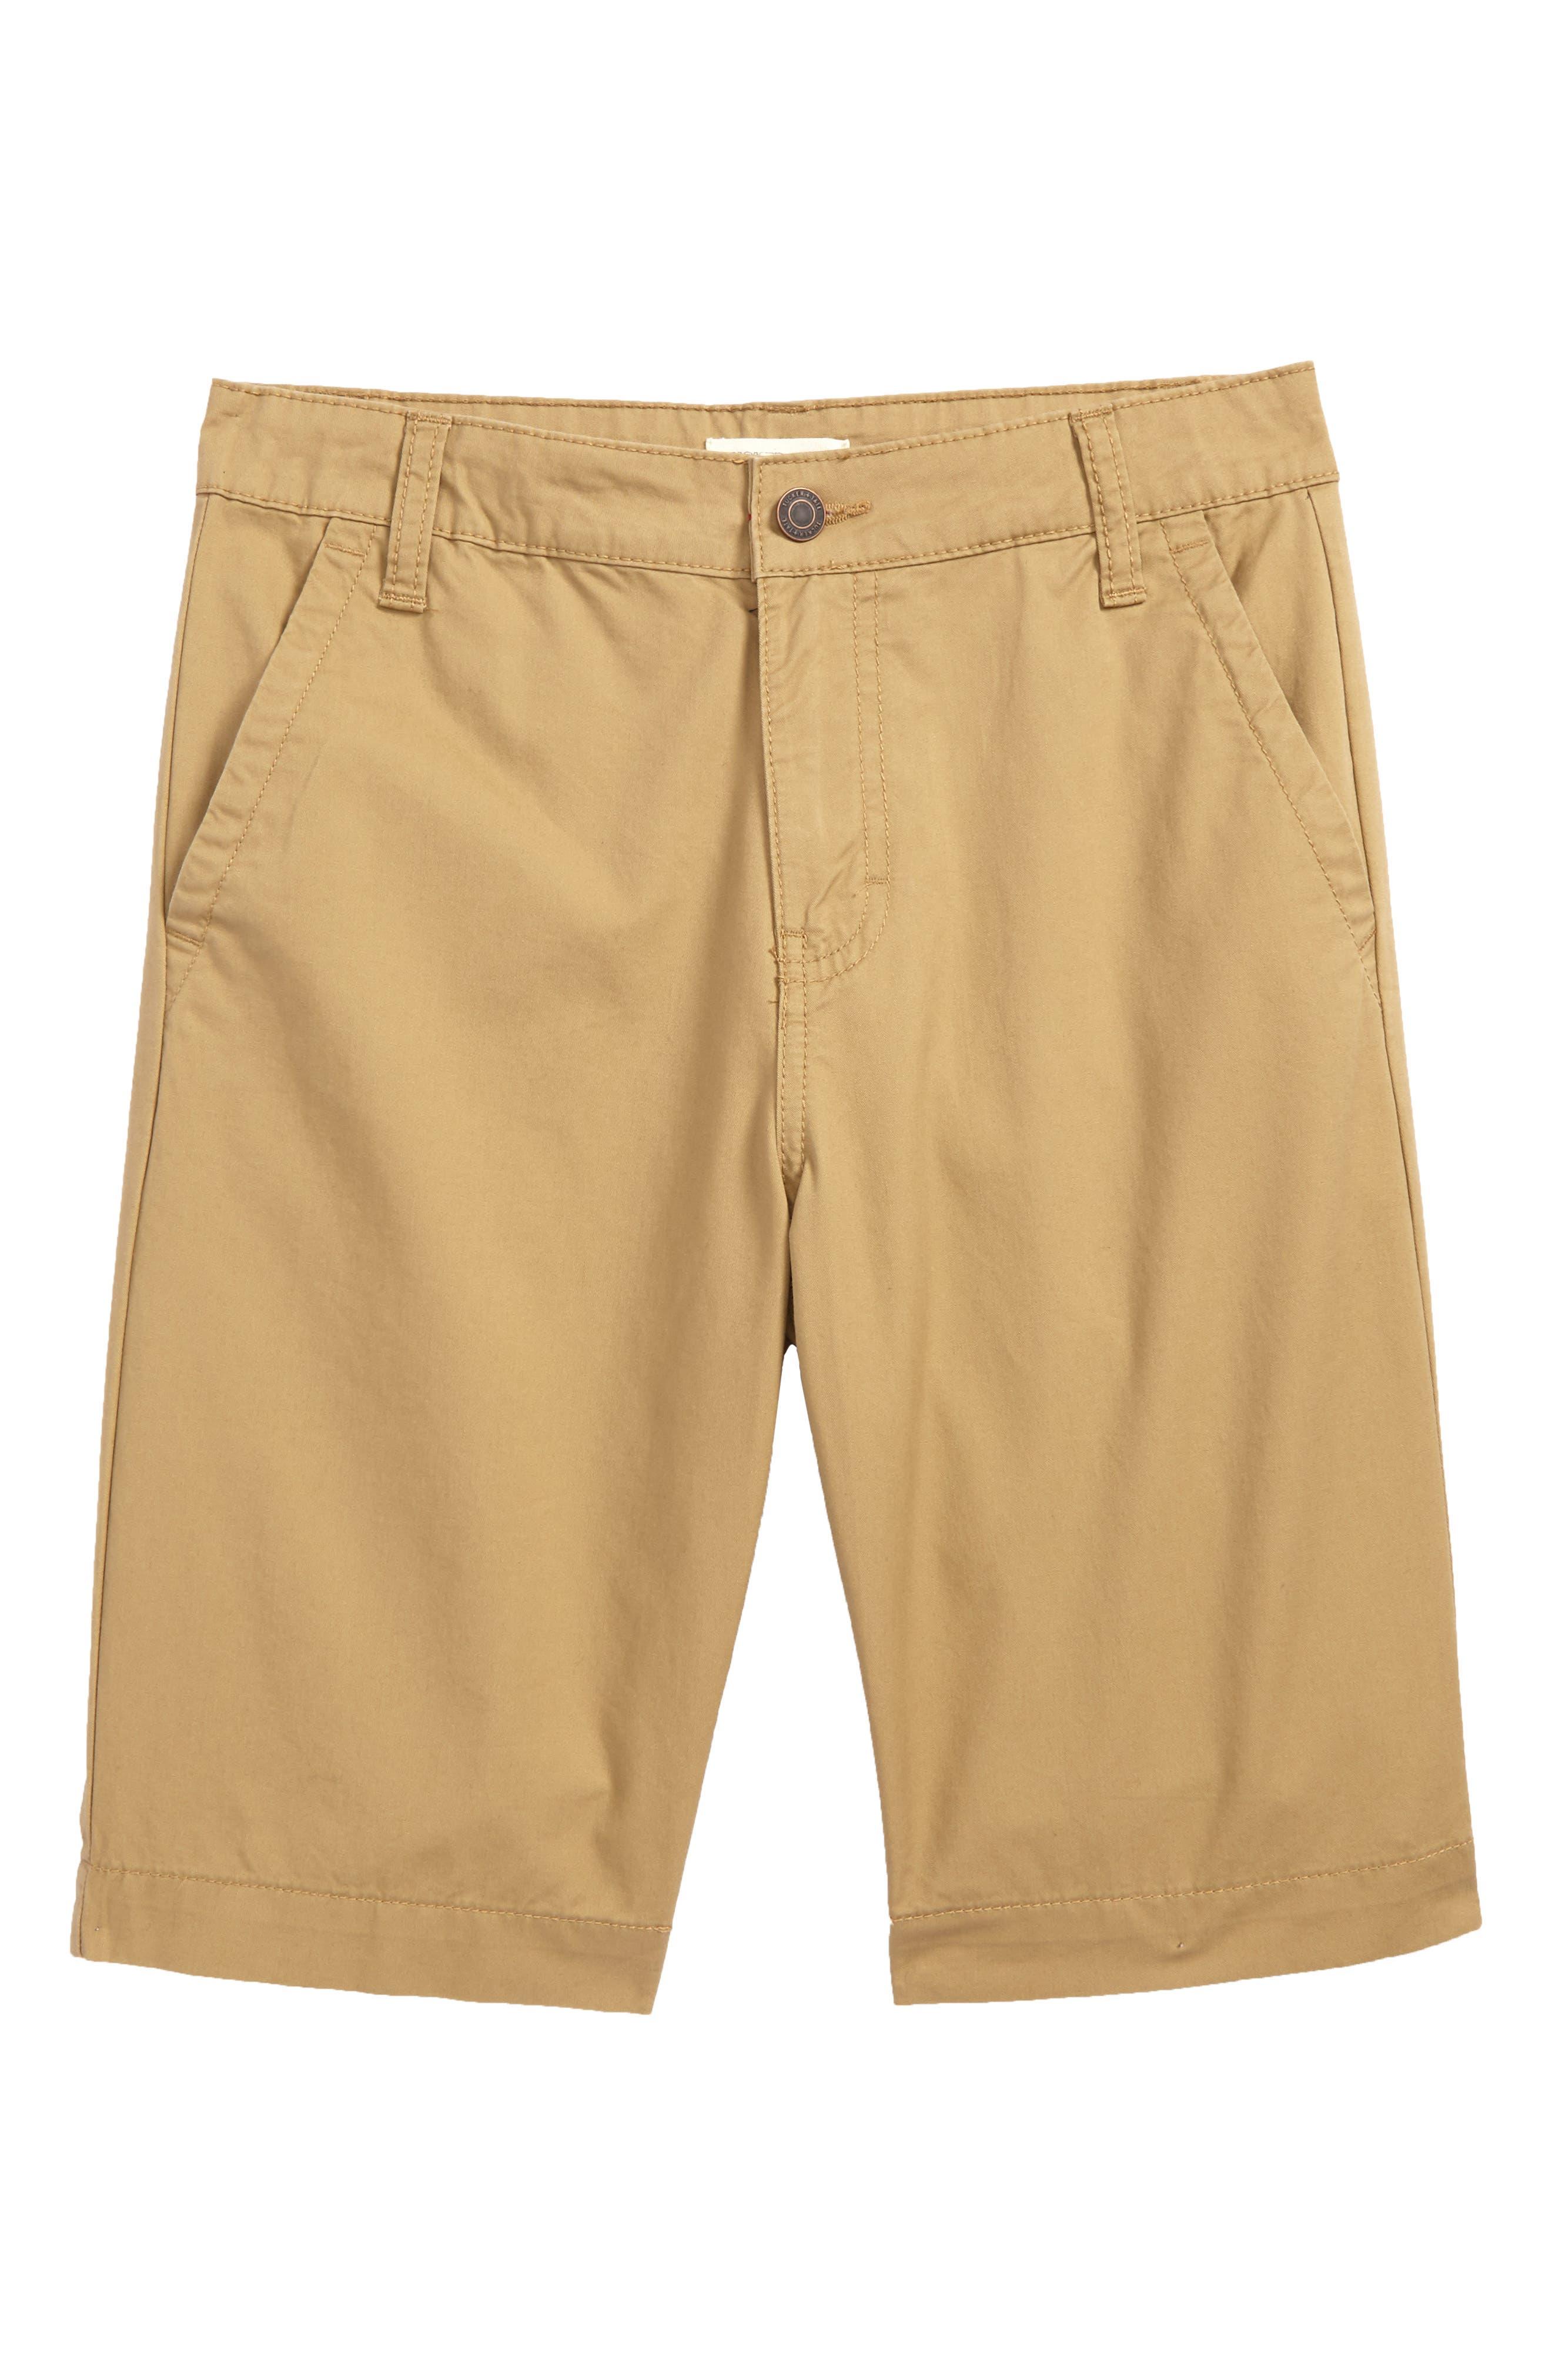 Tucker + Tate Chino Shorts (Big Boys)